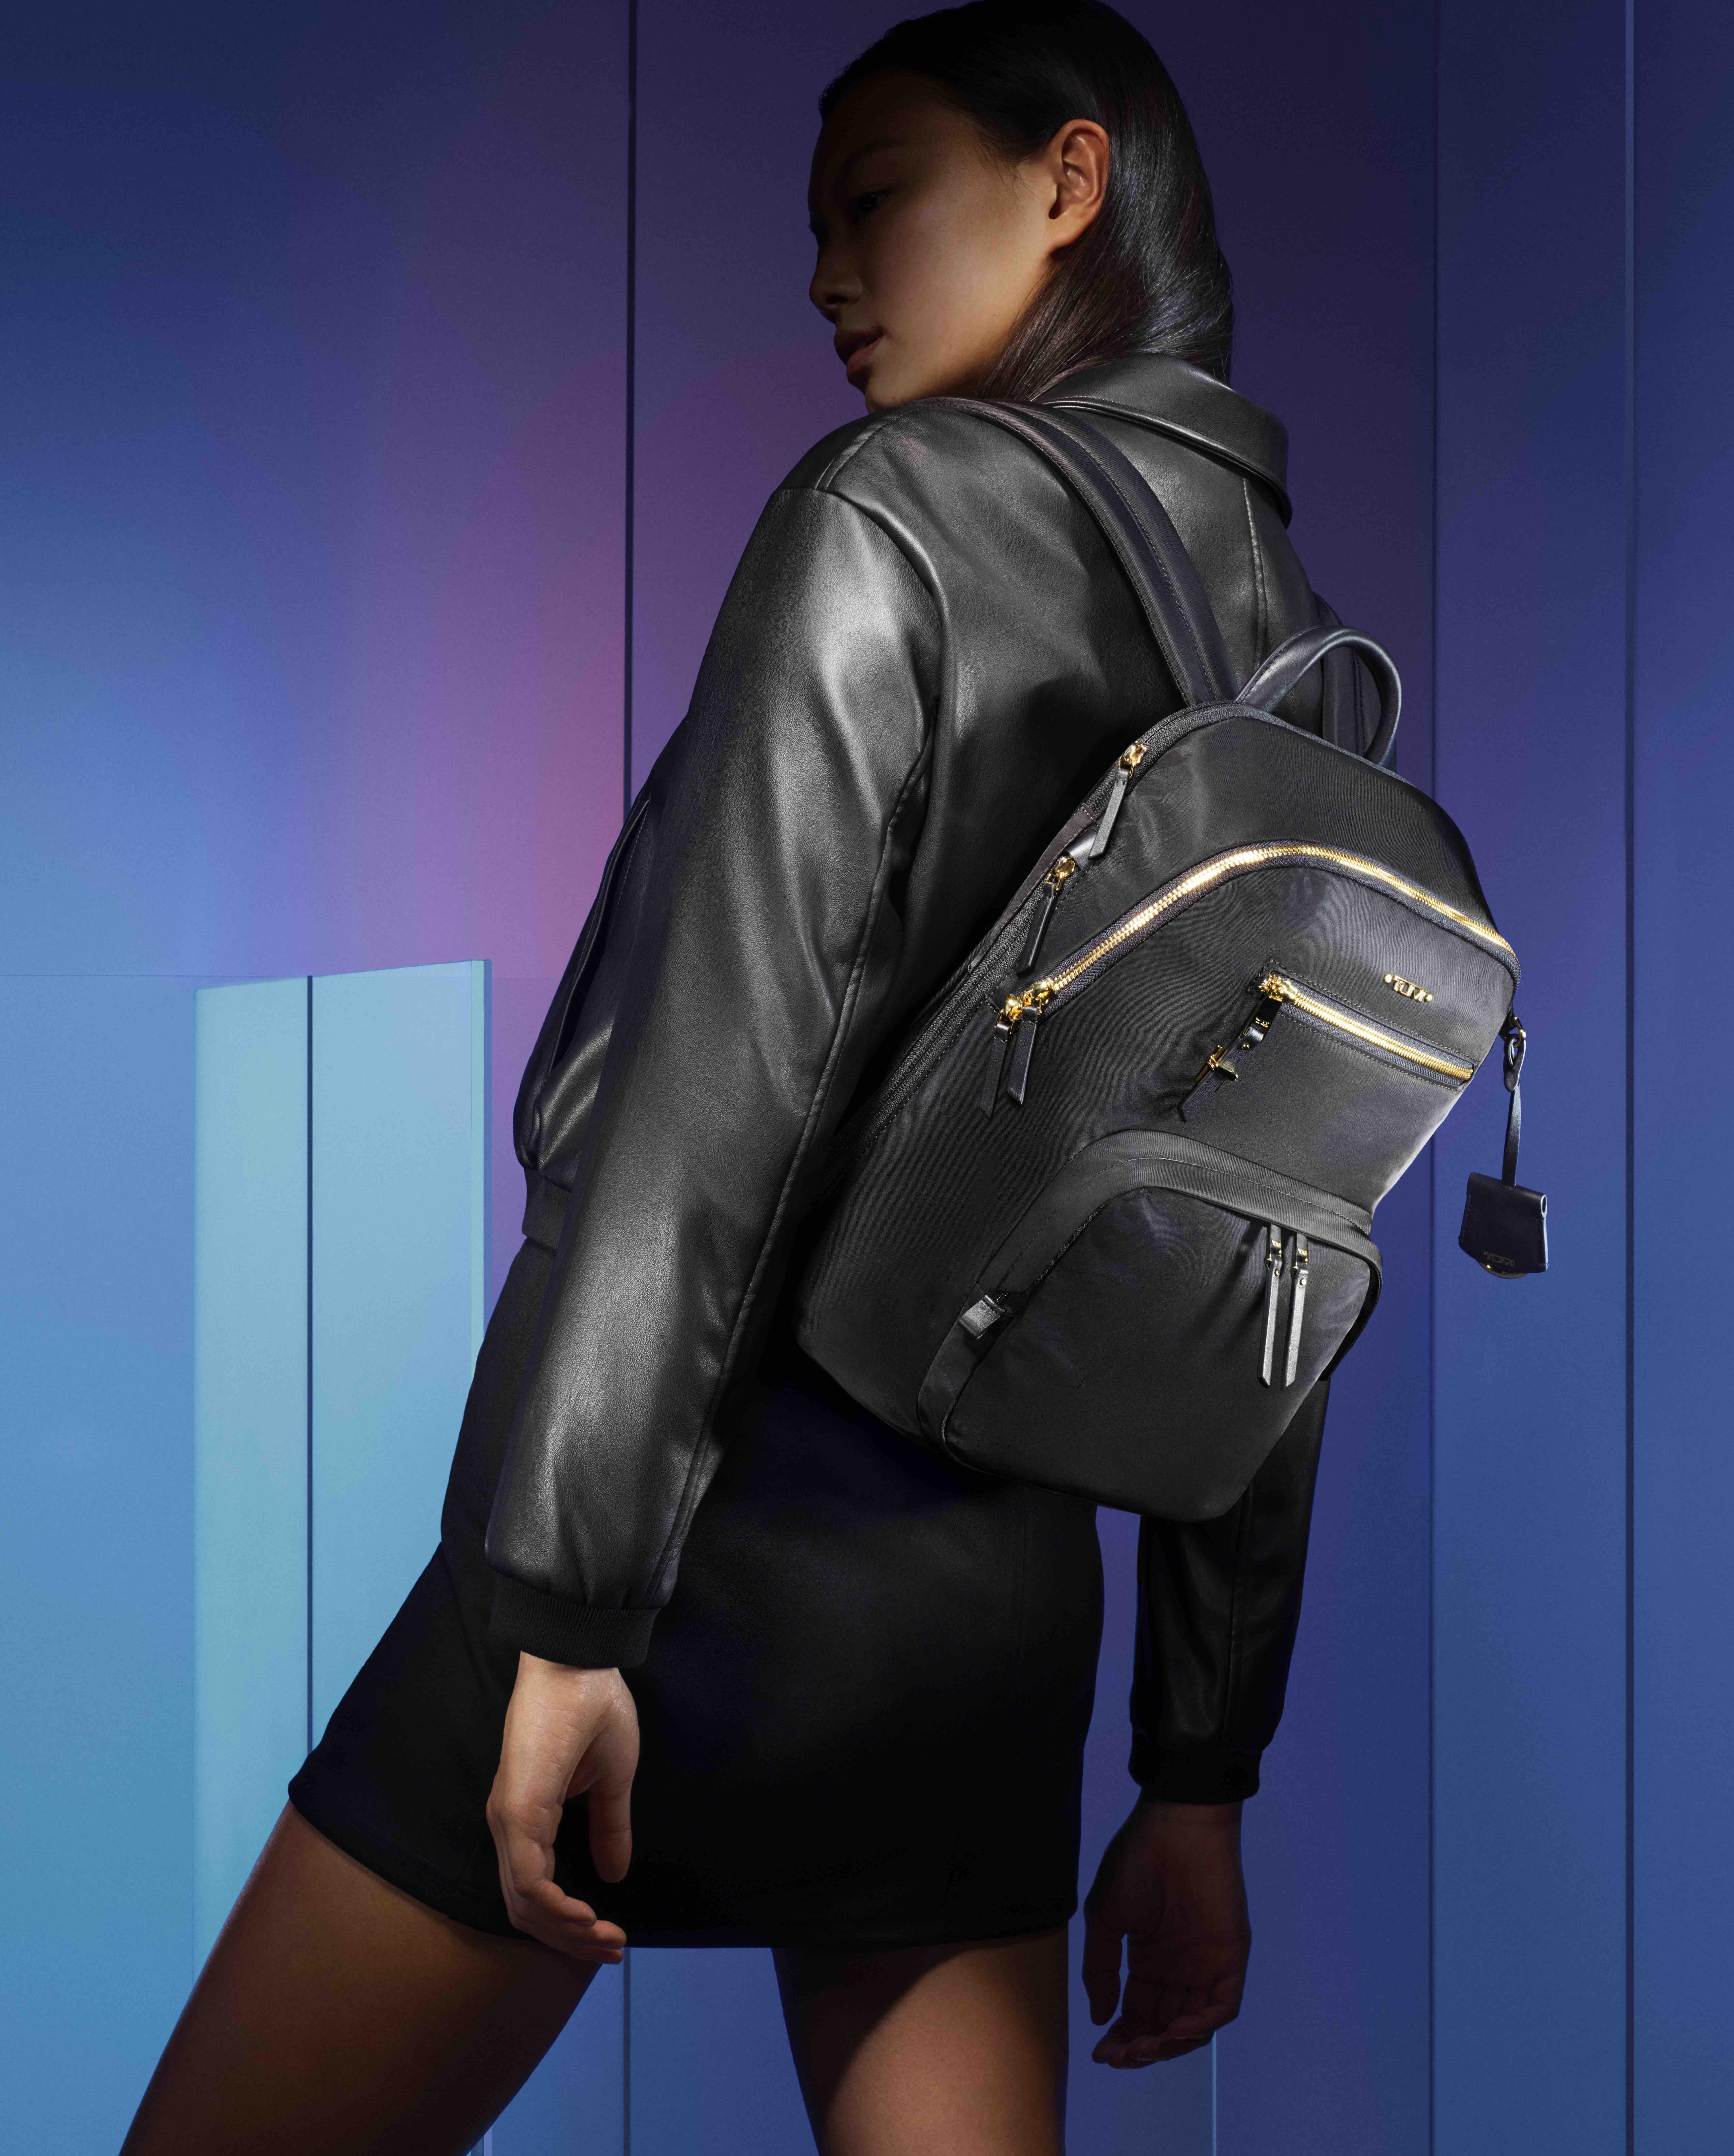 balo TUMI Voyaguer Harper Backpack màu đen